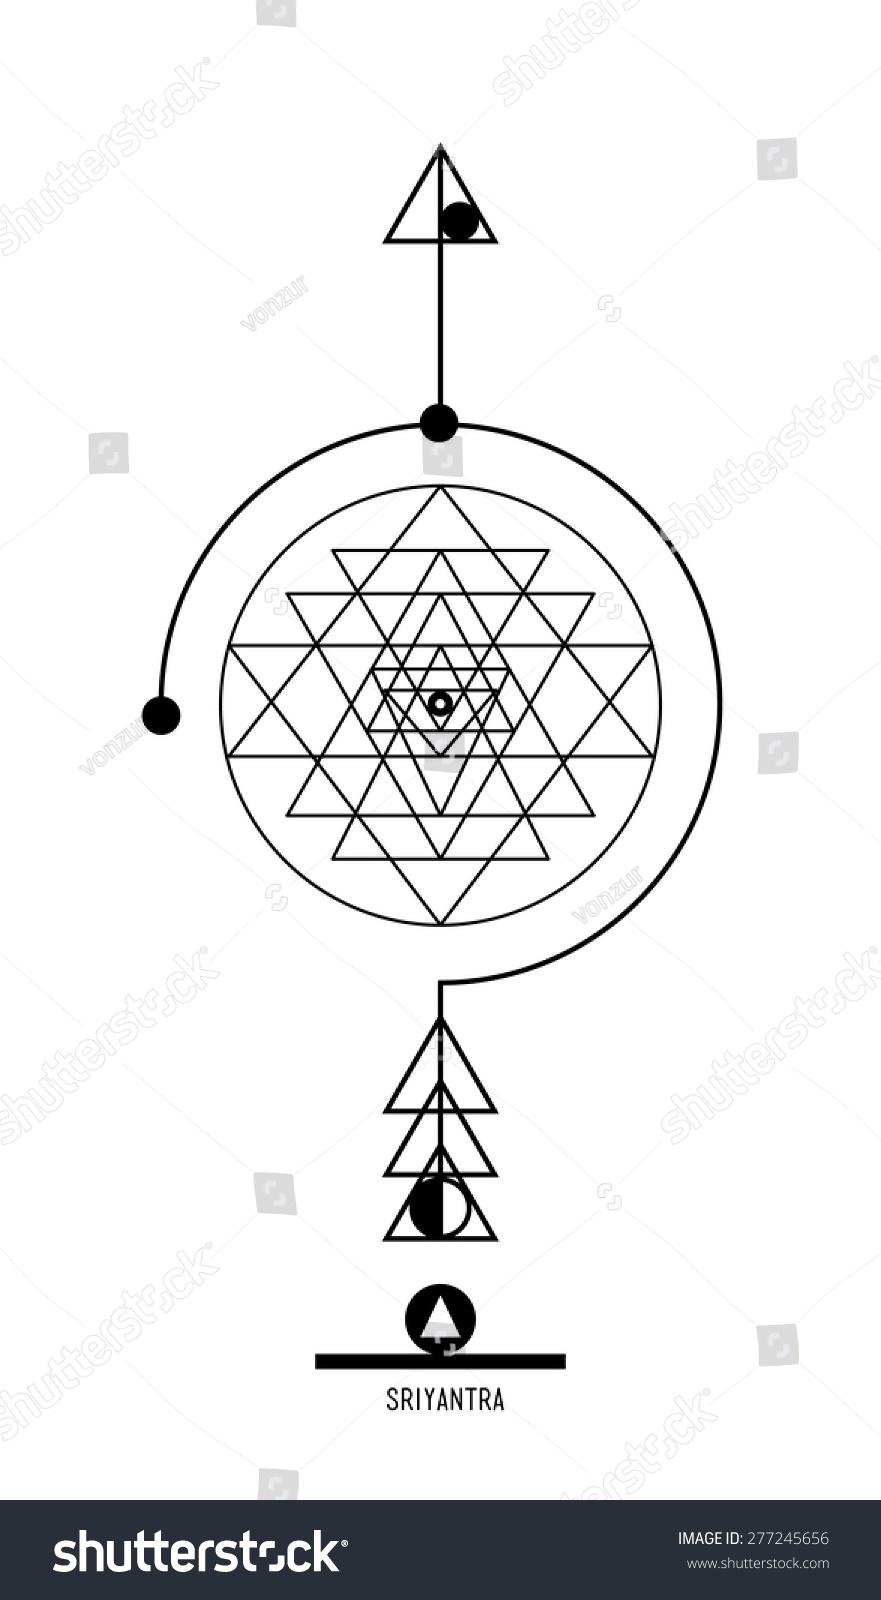 Sri yantra buddhist hindu tantric symbol stock vector 277245656 buddhist hindu tantric symbol harmony and balance cosmos and the universe used biocorpaavc Images